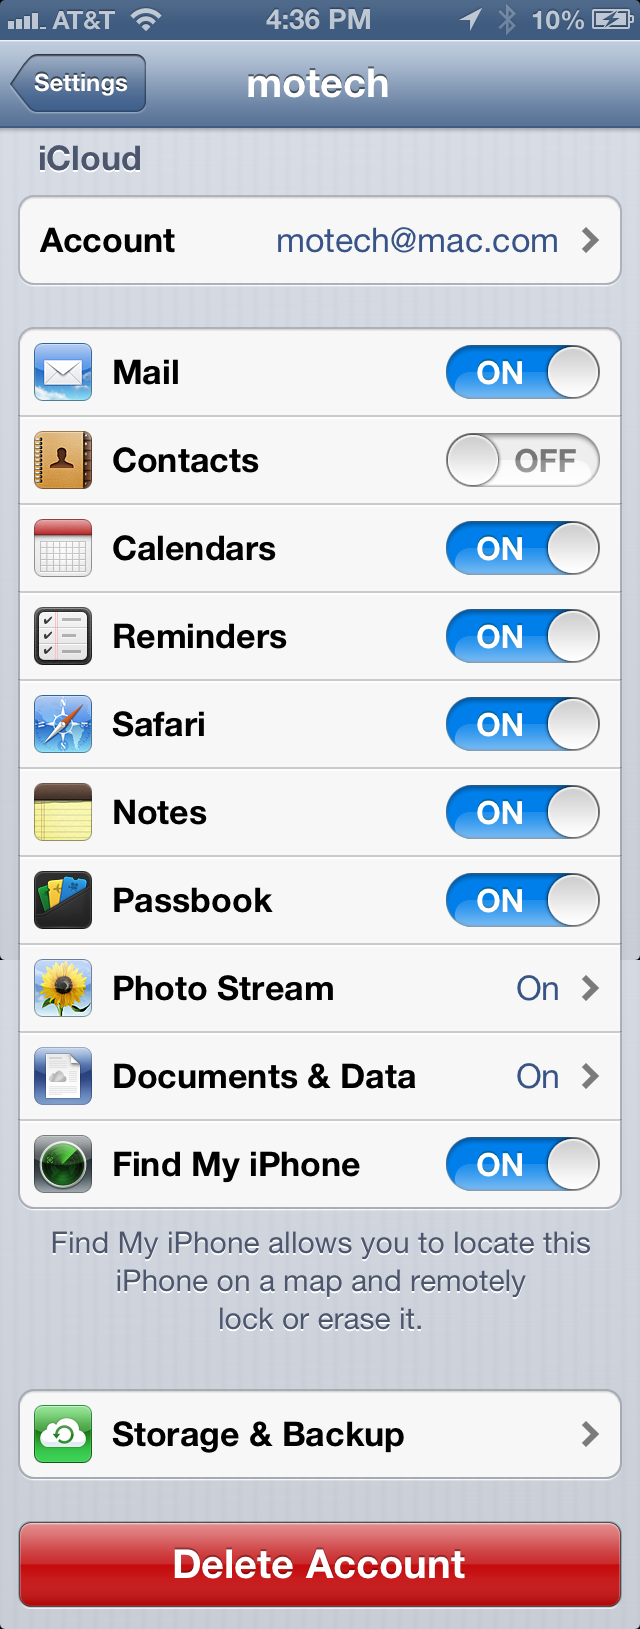 How Do I Backup My Iphone